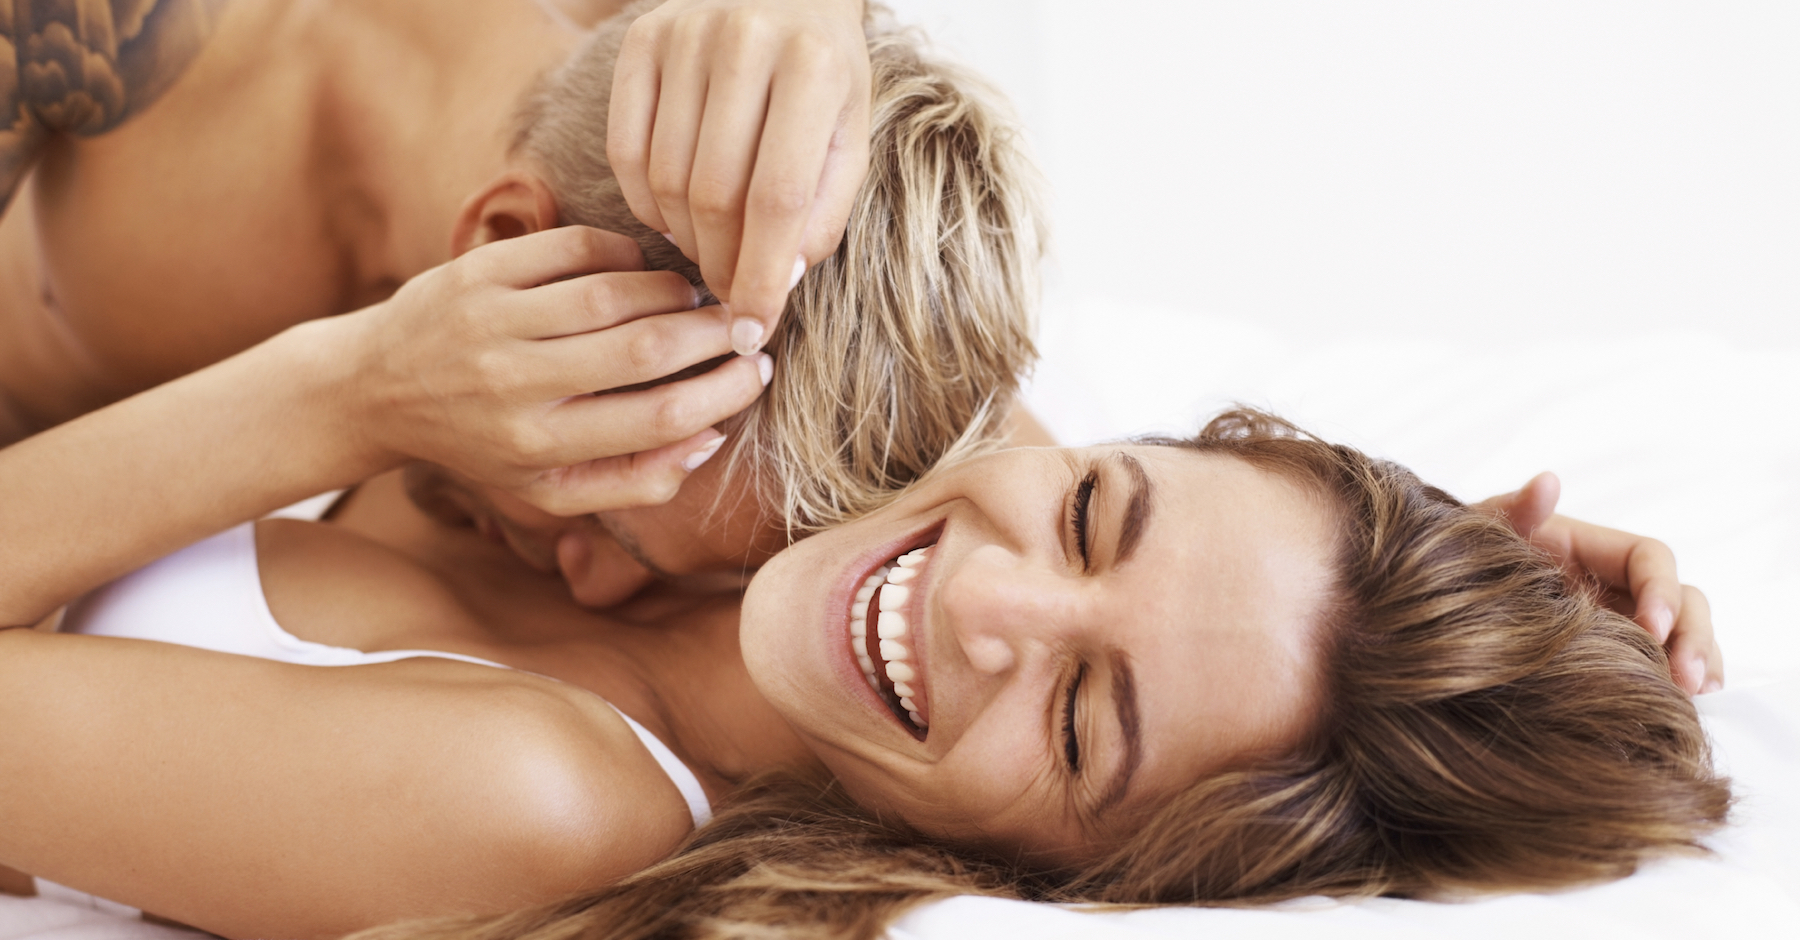 sex ,preparation Sex,Relationship, condom